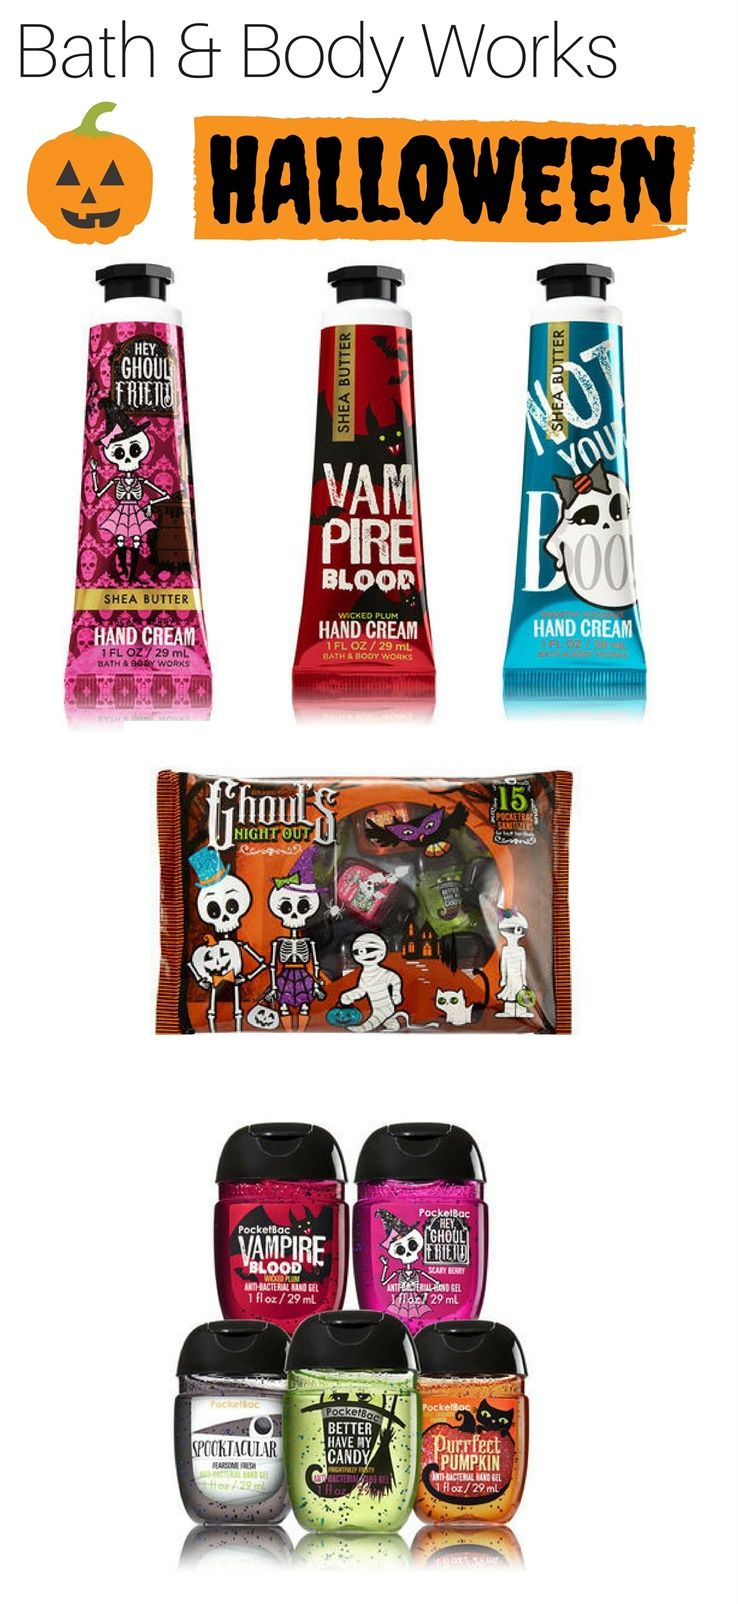 Bath Body Works Hand Creams Pocketbac For Halloween 2017